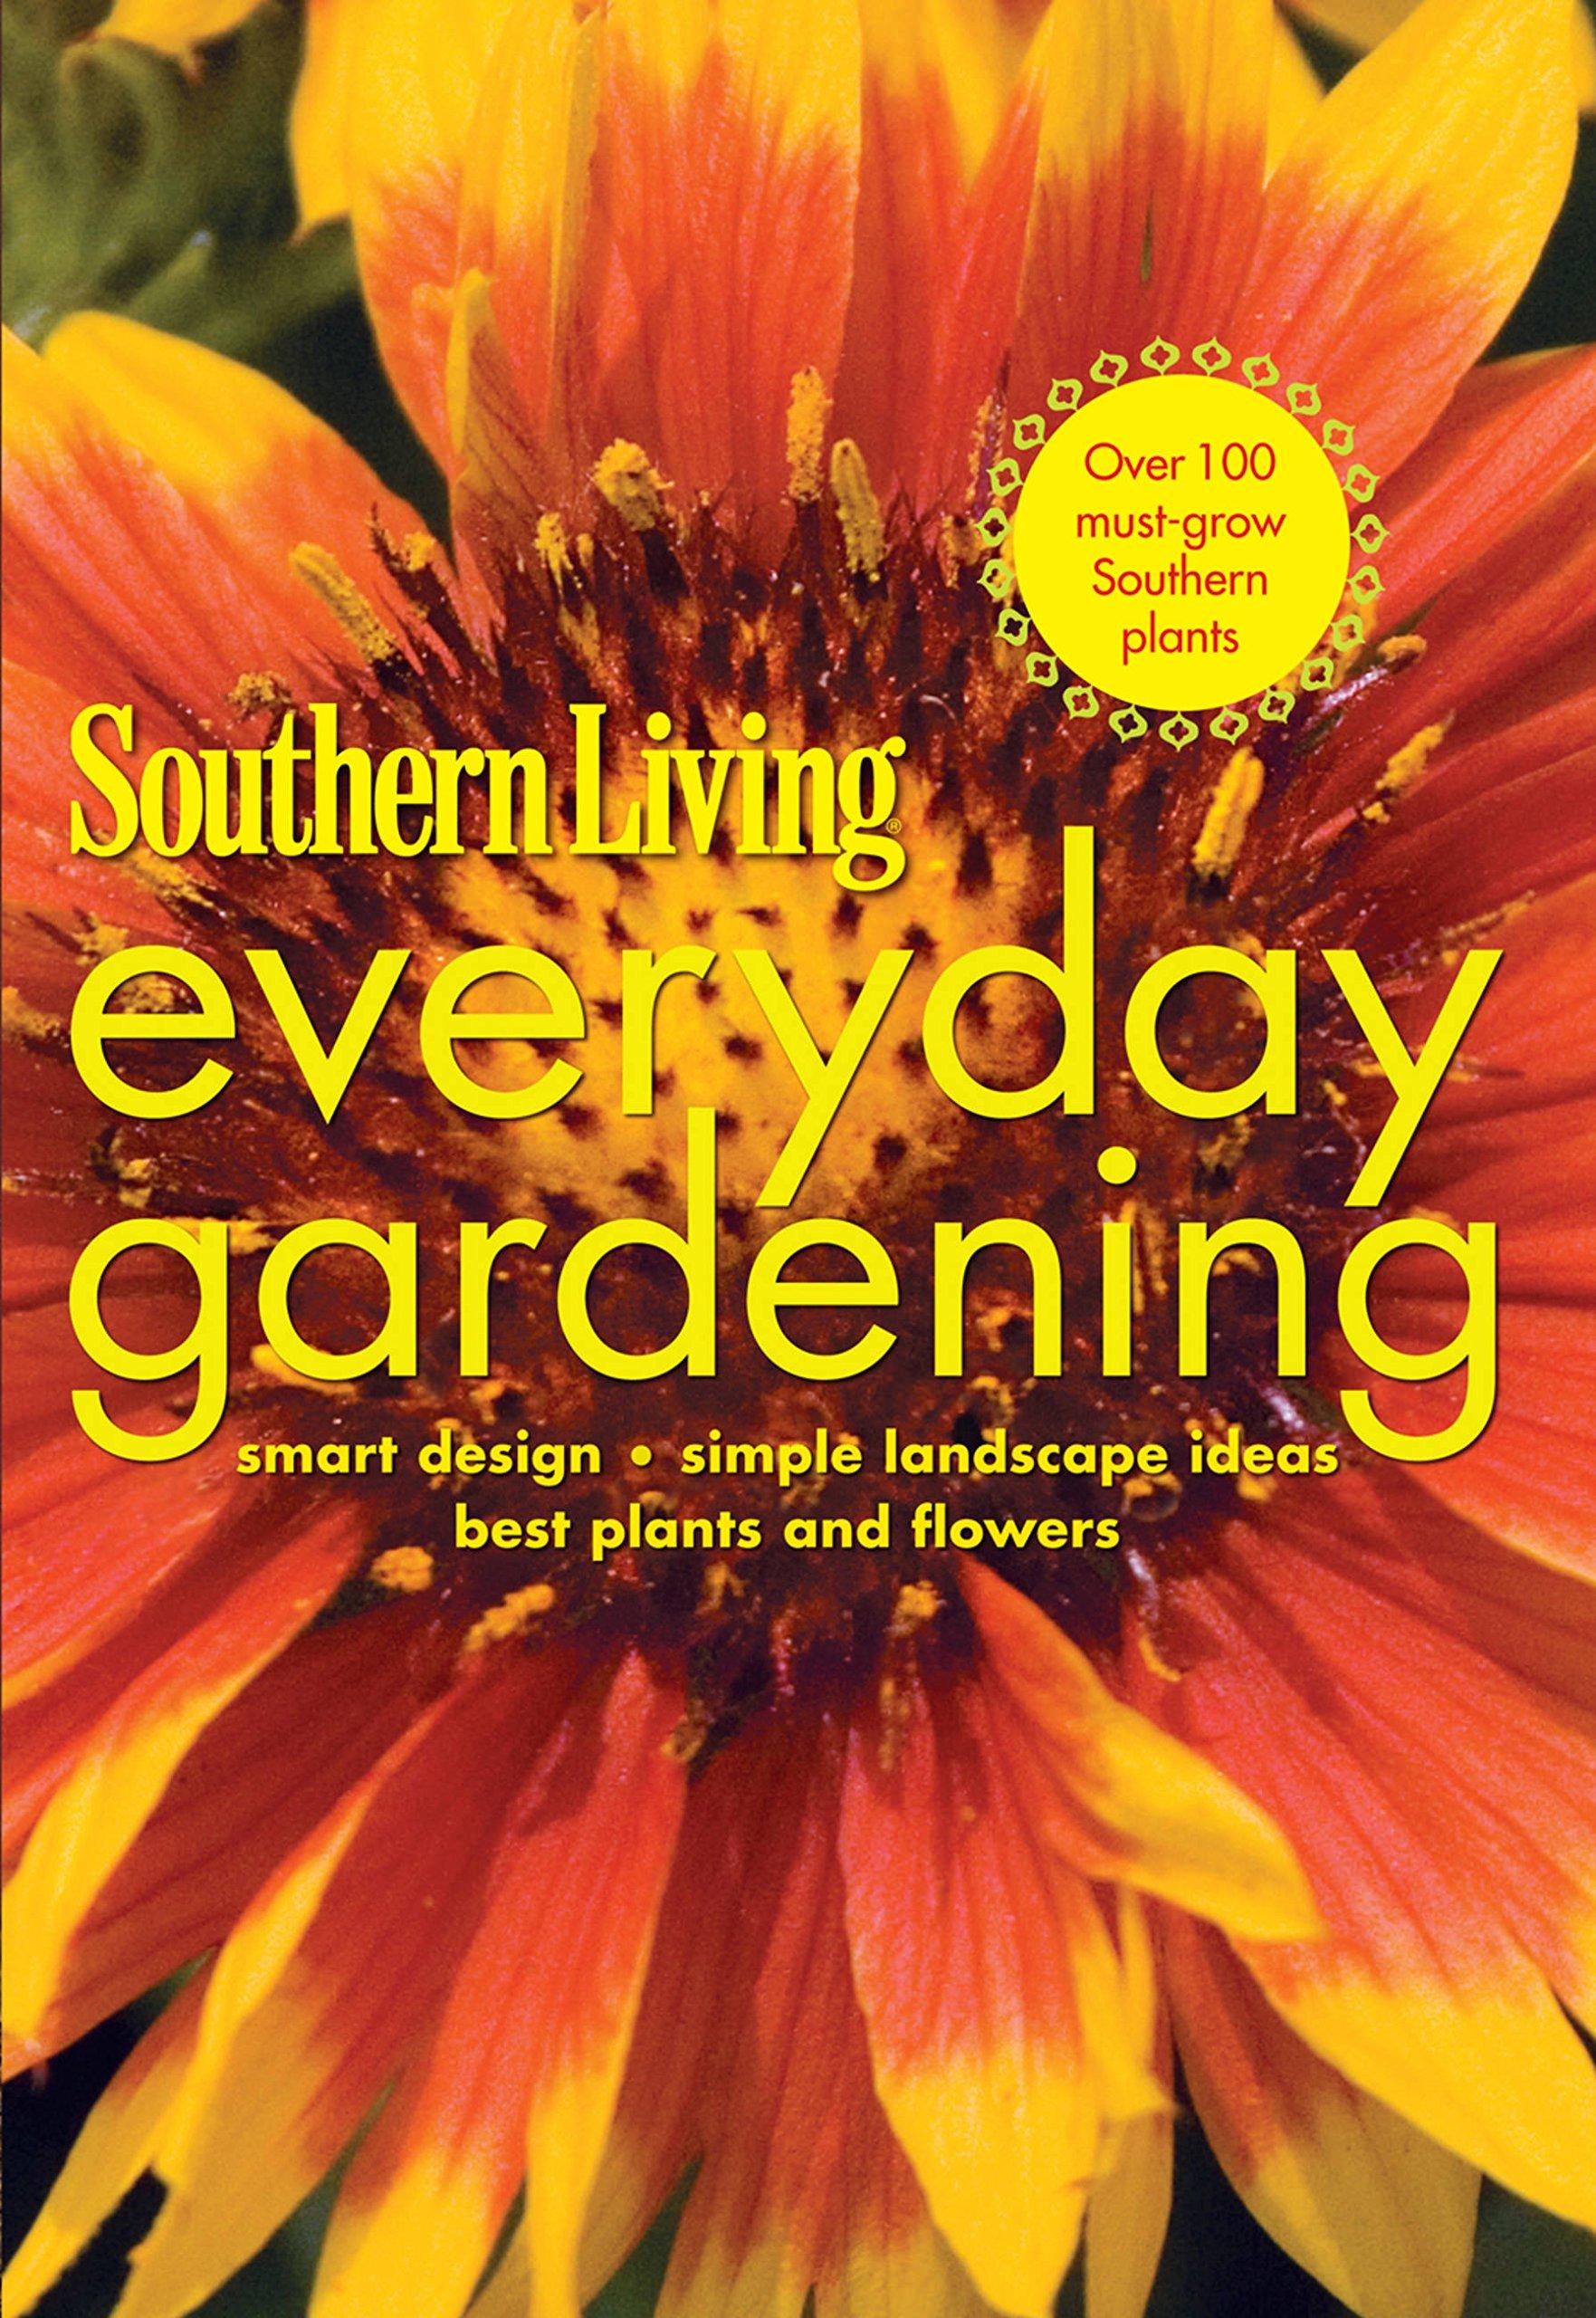 Southern Living Everyday Gardening Smart Design Simple Landscape